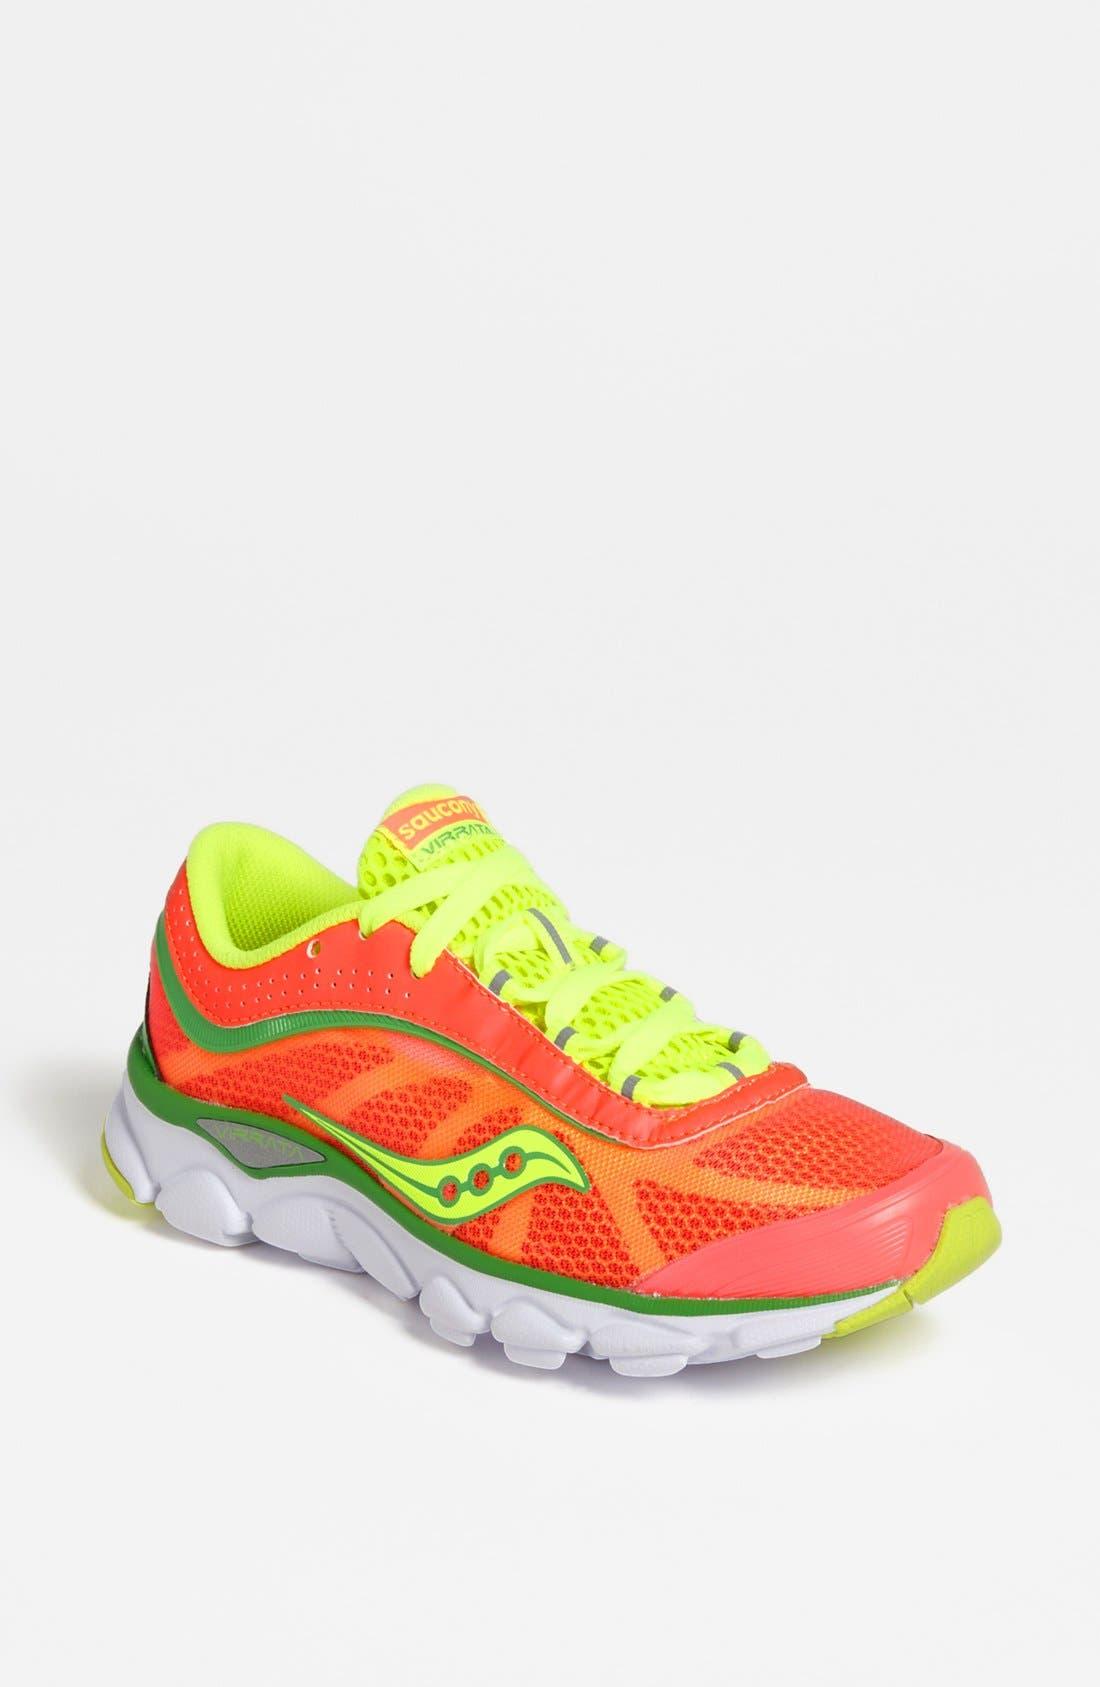 Alternate Image 1 Selected - Saucony 'Virrata' Running Shoe (Women)